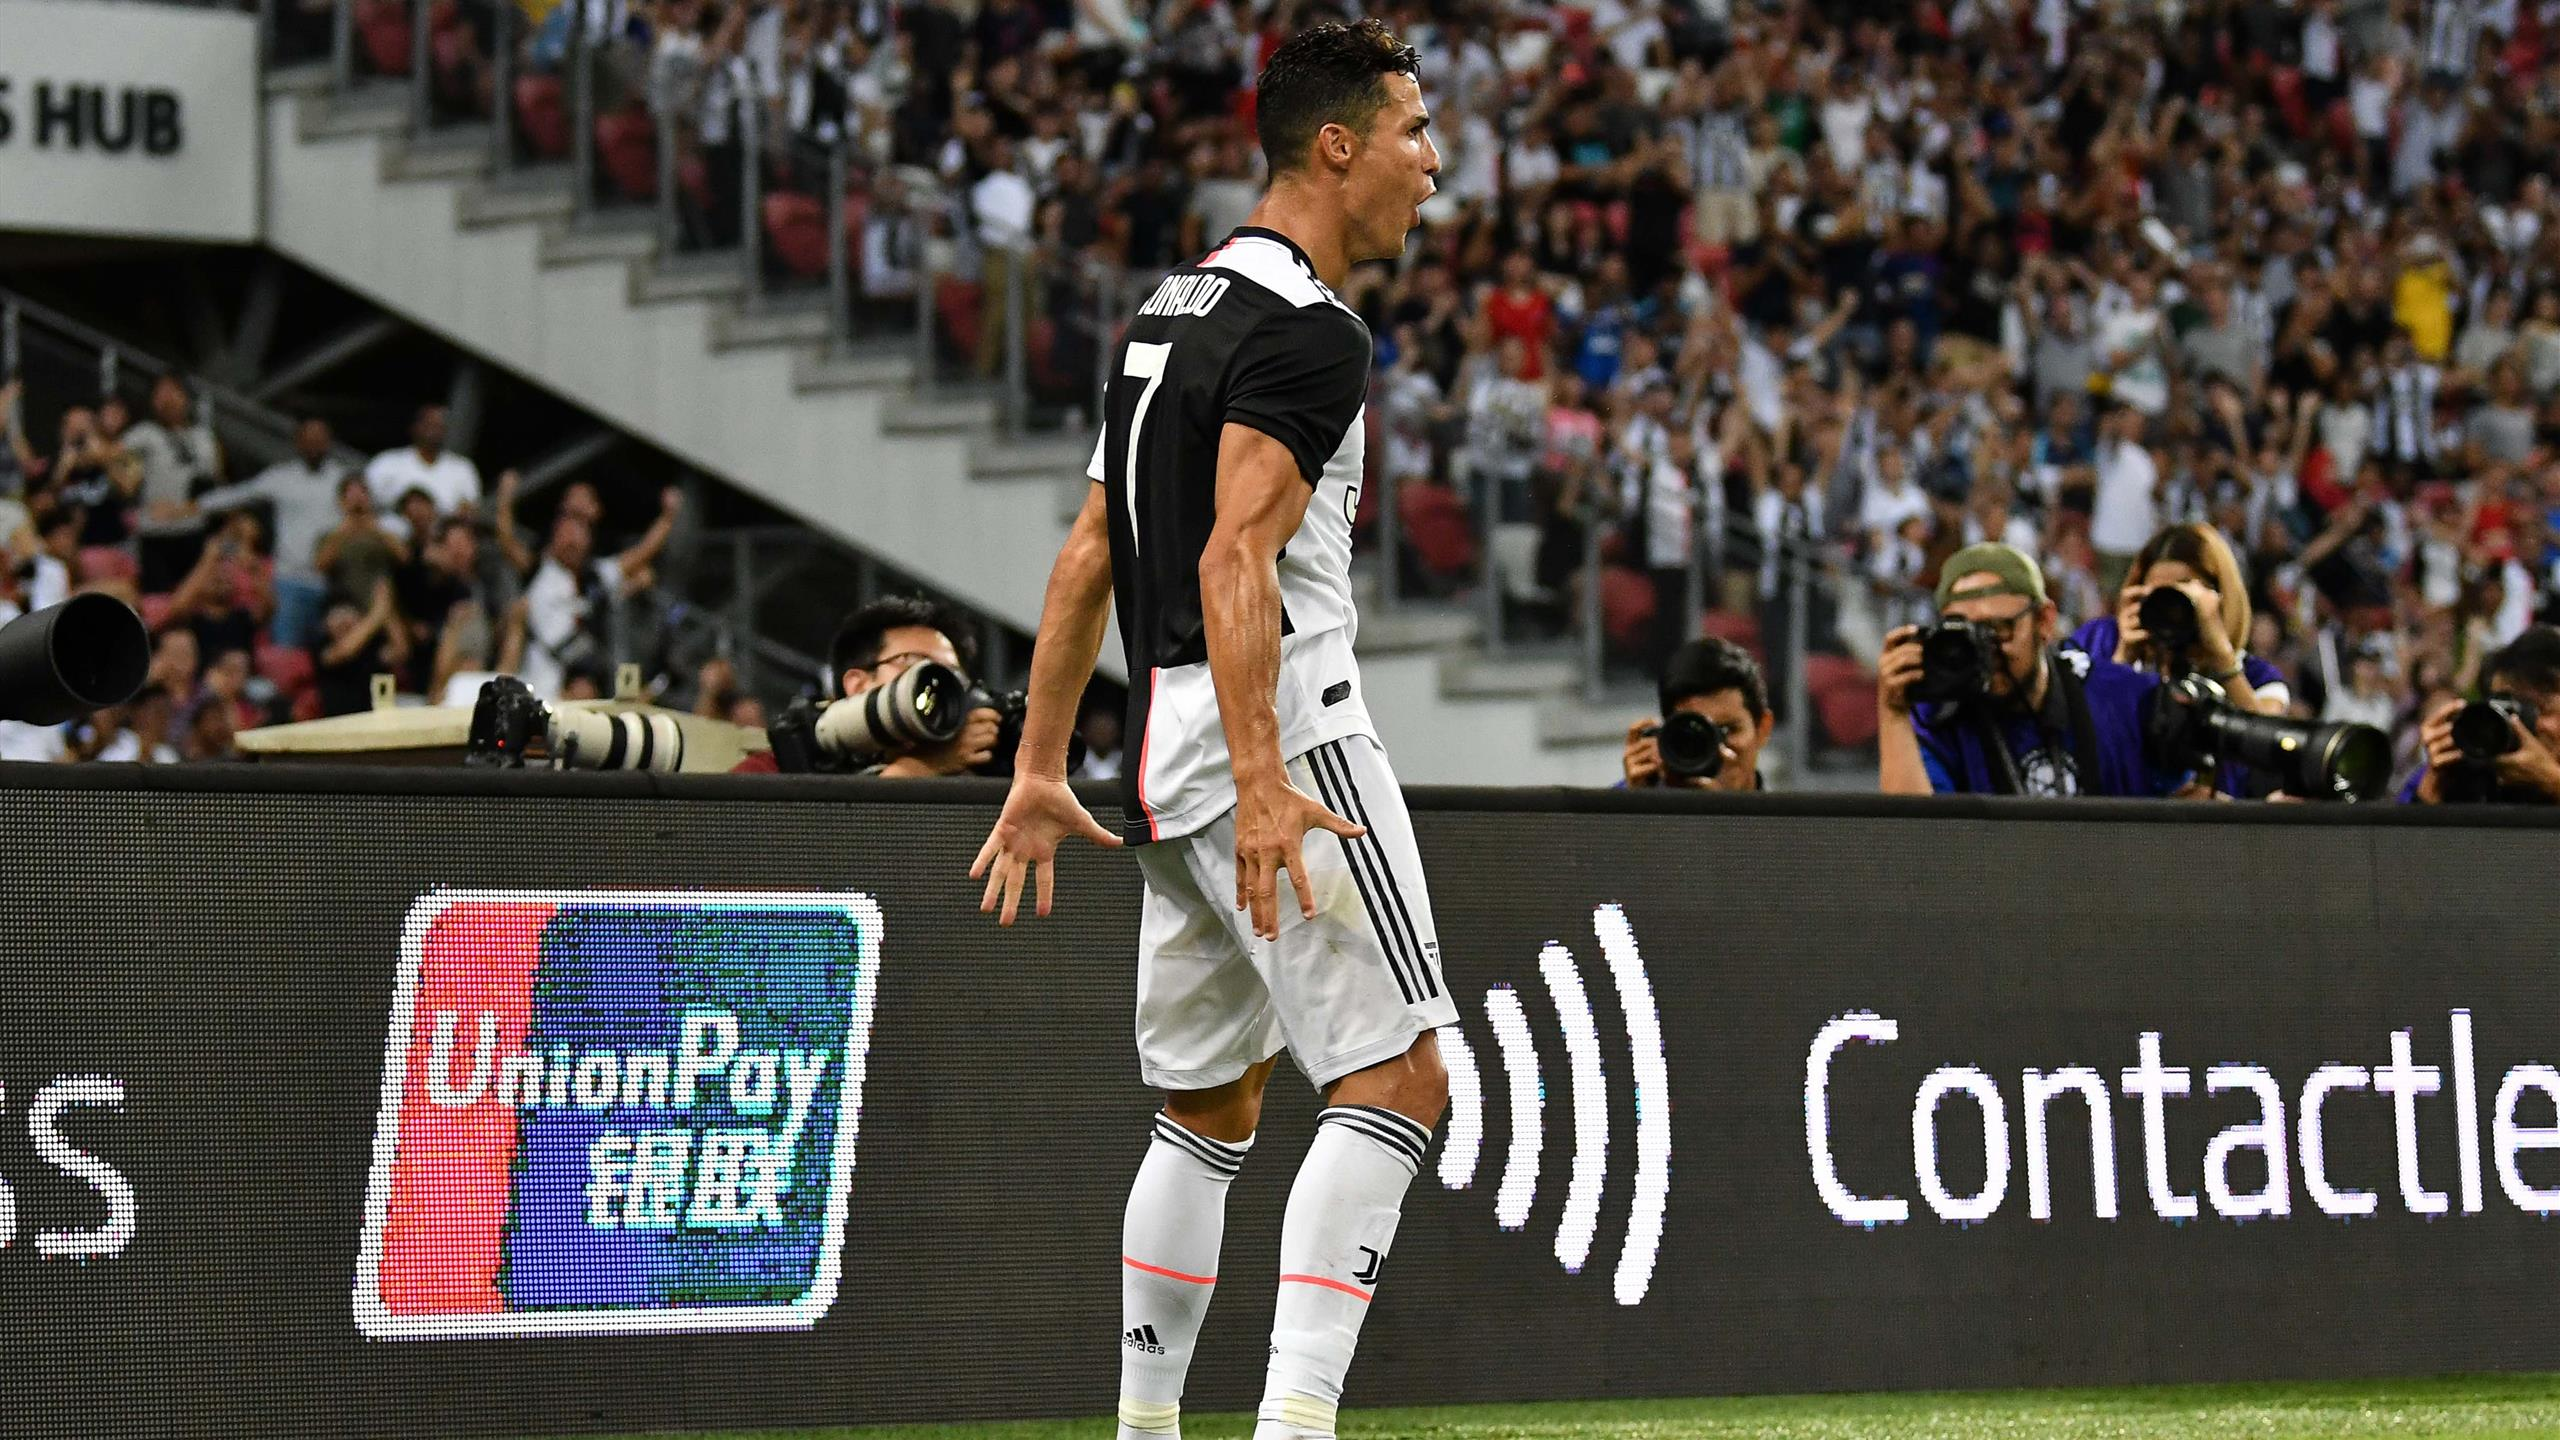 Parma-Juventus in Diretta tv e Live-Streaming - Eurosport